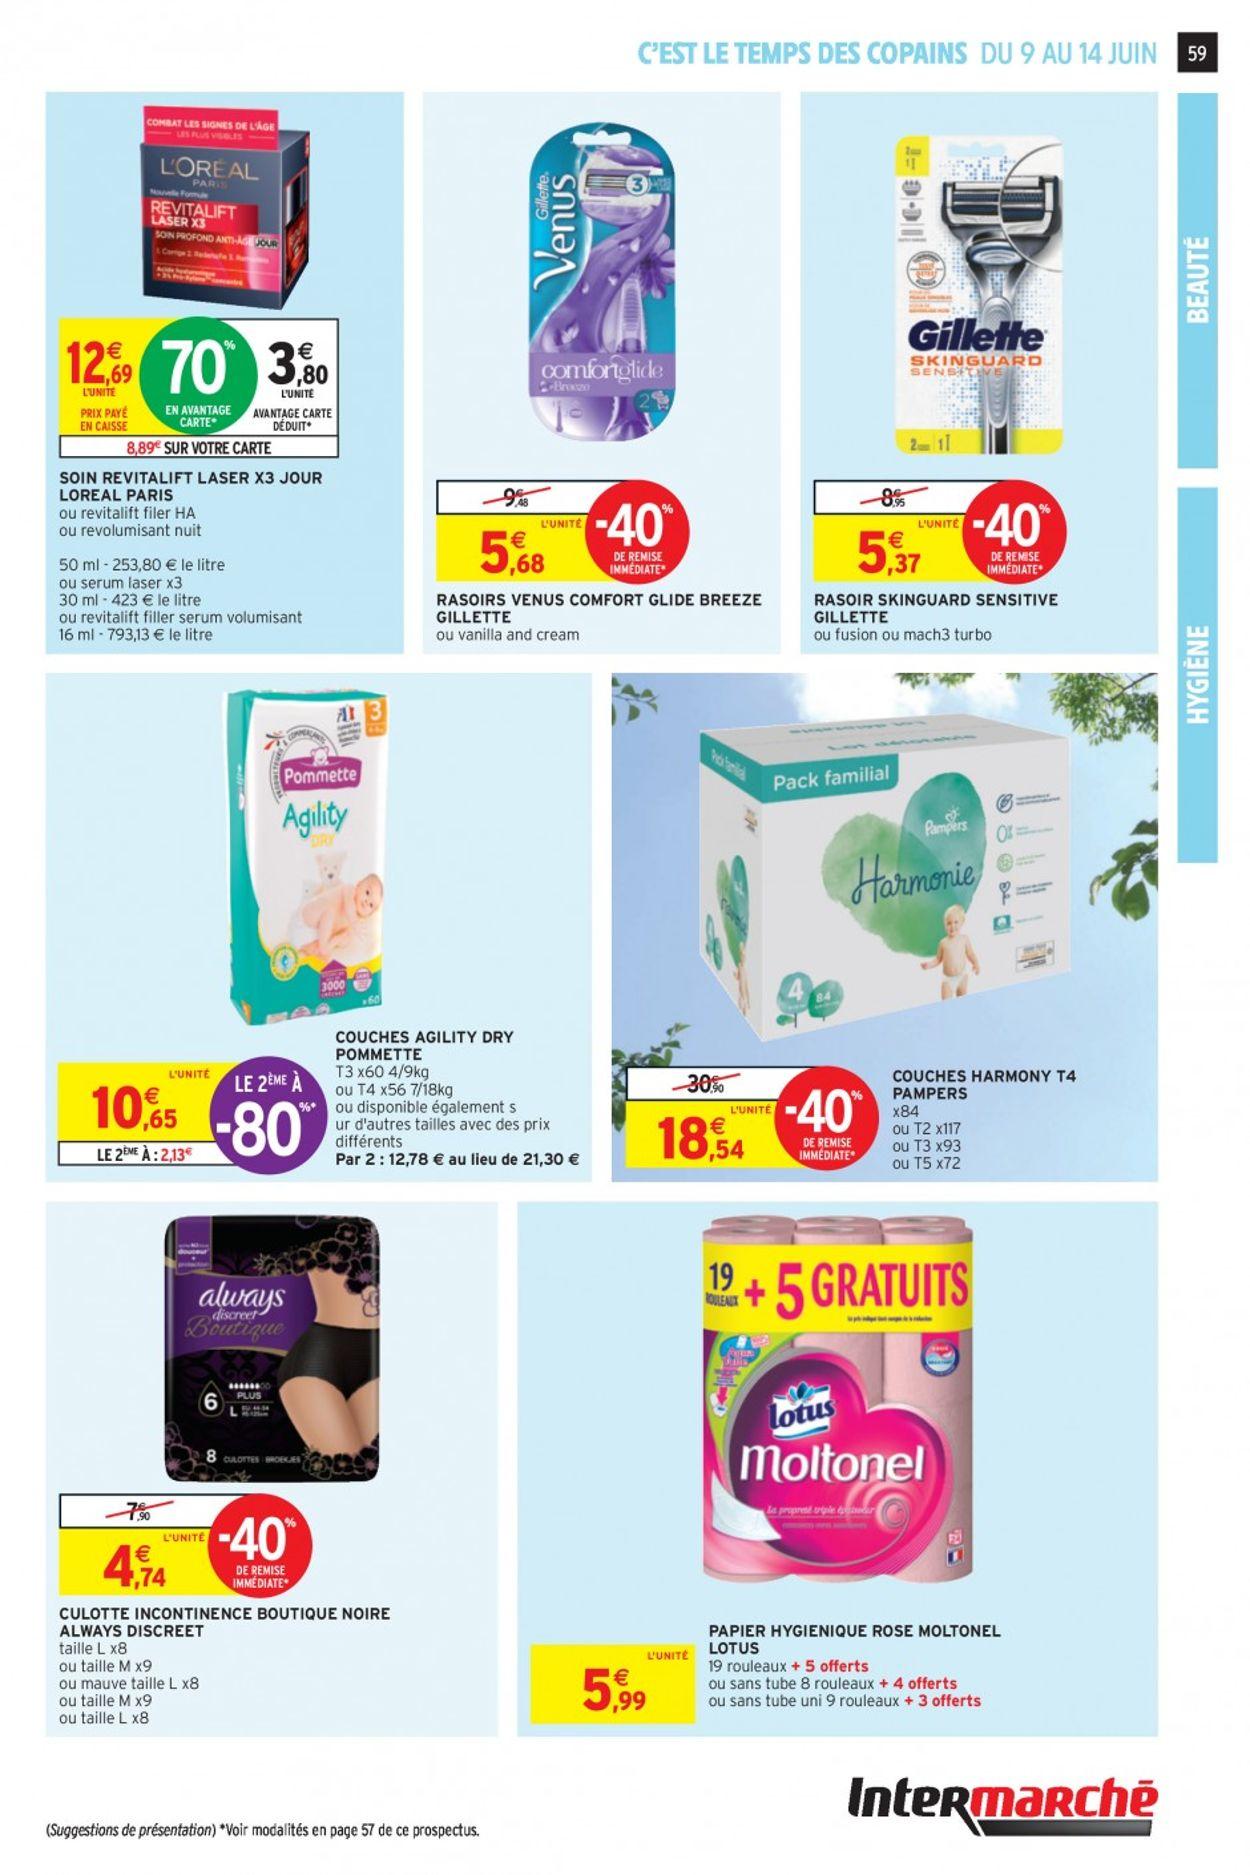 Intermarché Catalogue - 09.06-14.06.2020 (Page 58)